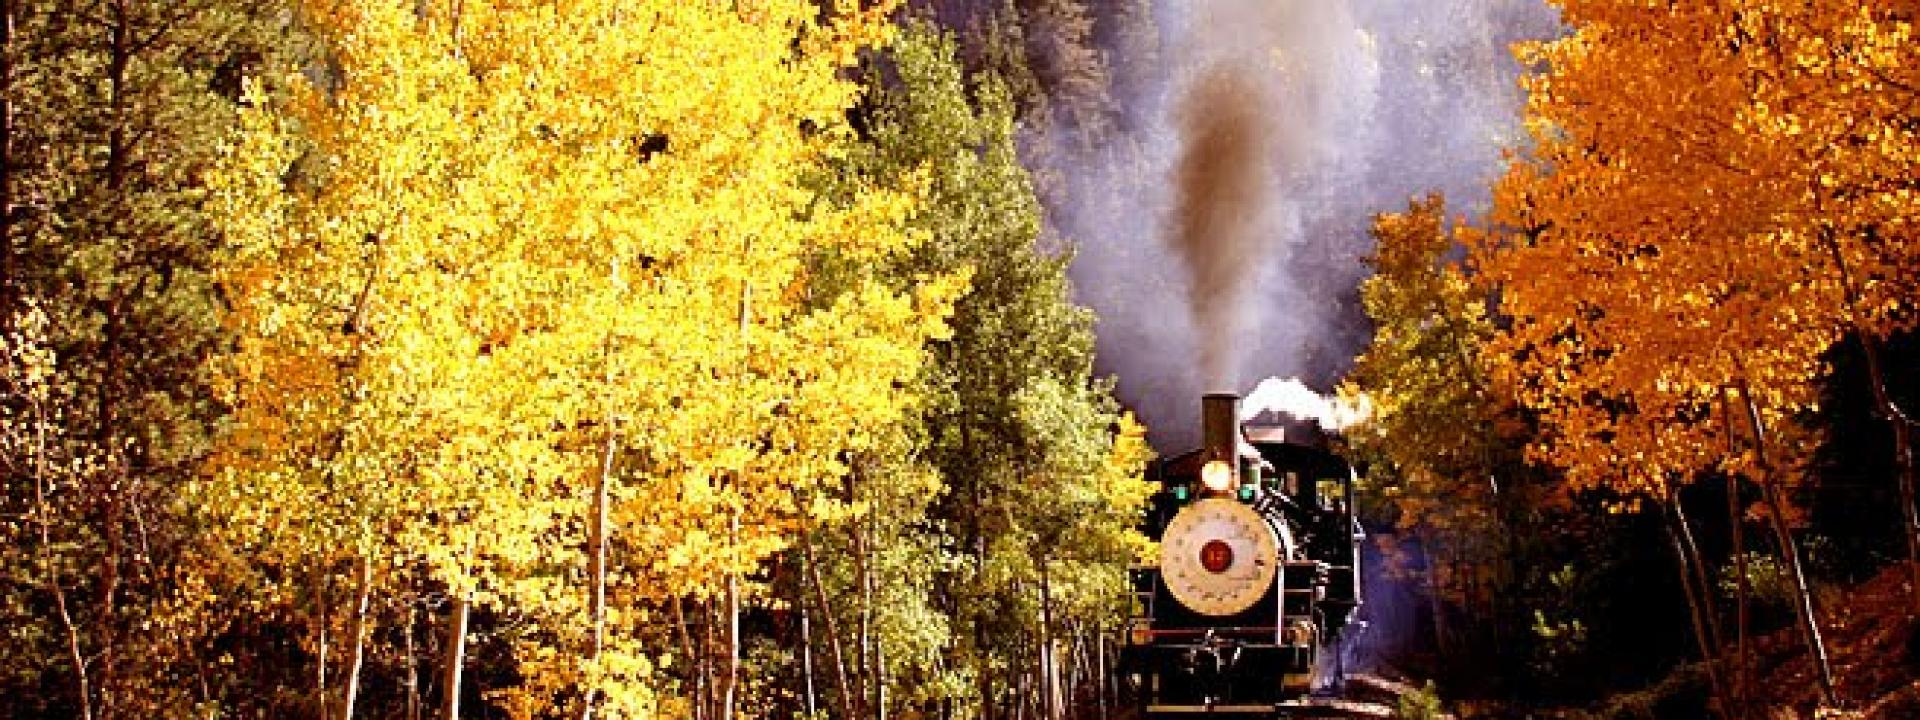 Georgetown Loop Train Rides near Winter Park, Colorado